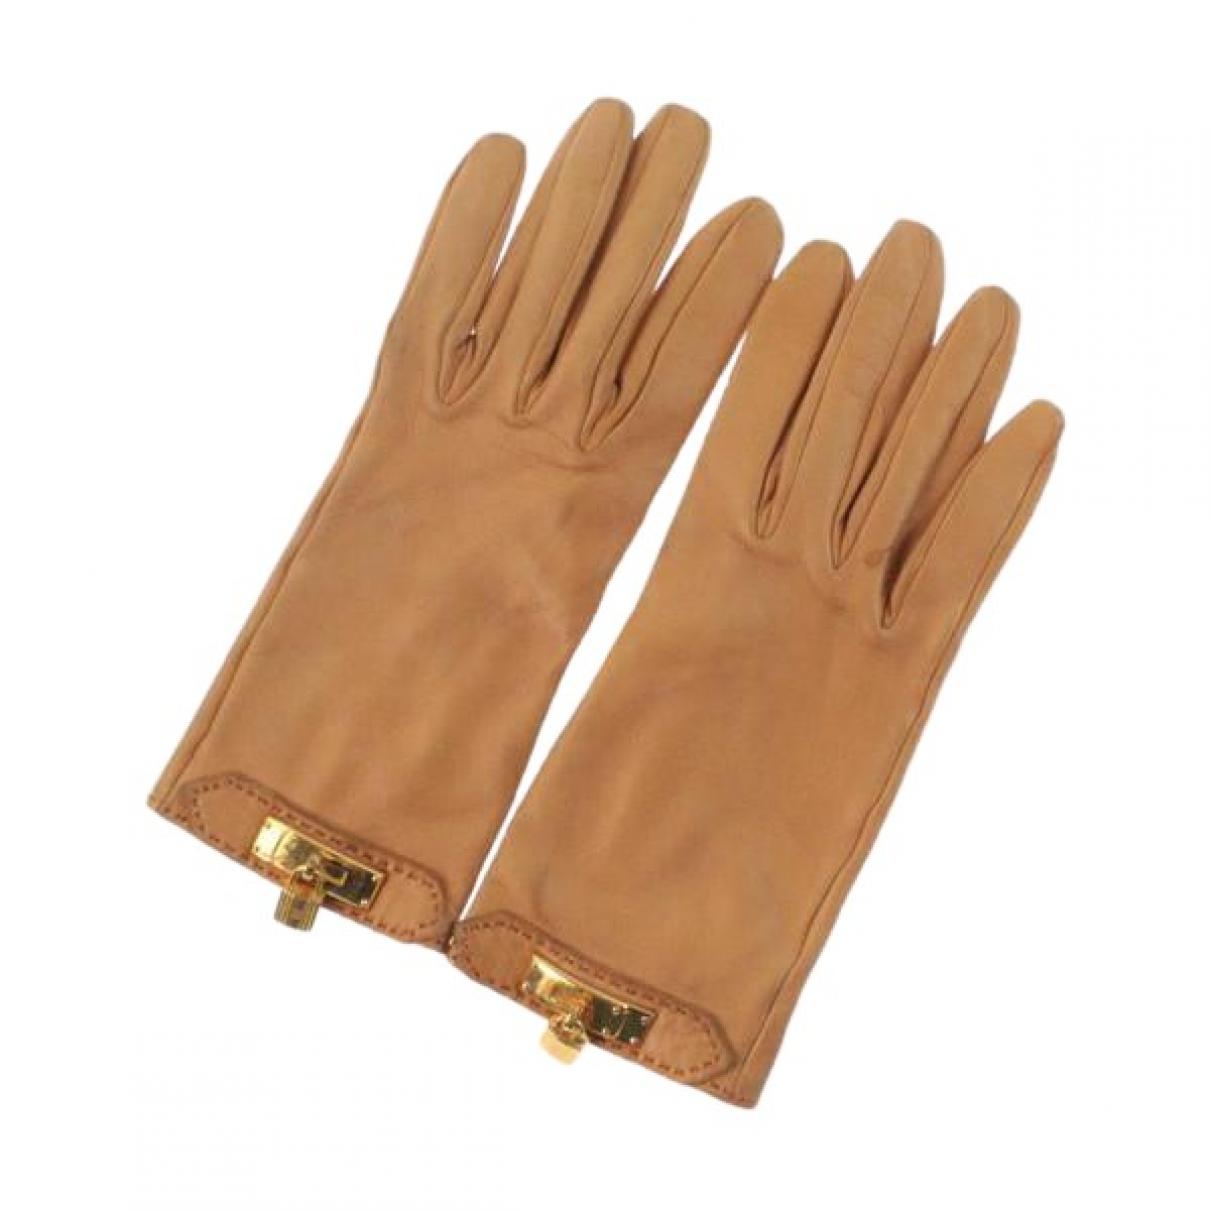 Hermès \N Beige Leather Gloves for Women M International